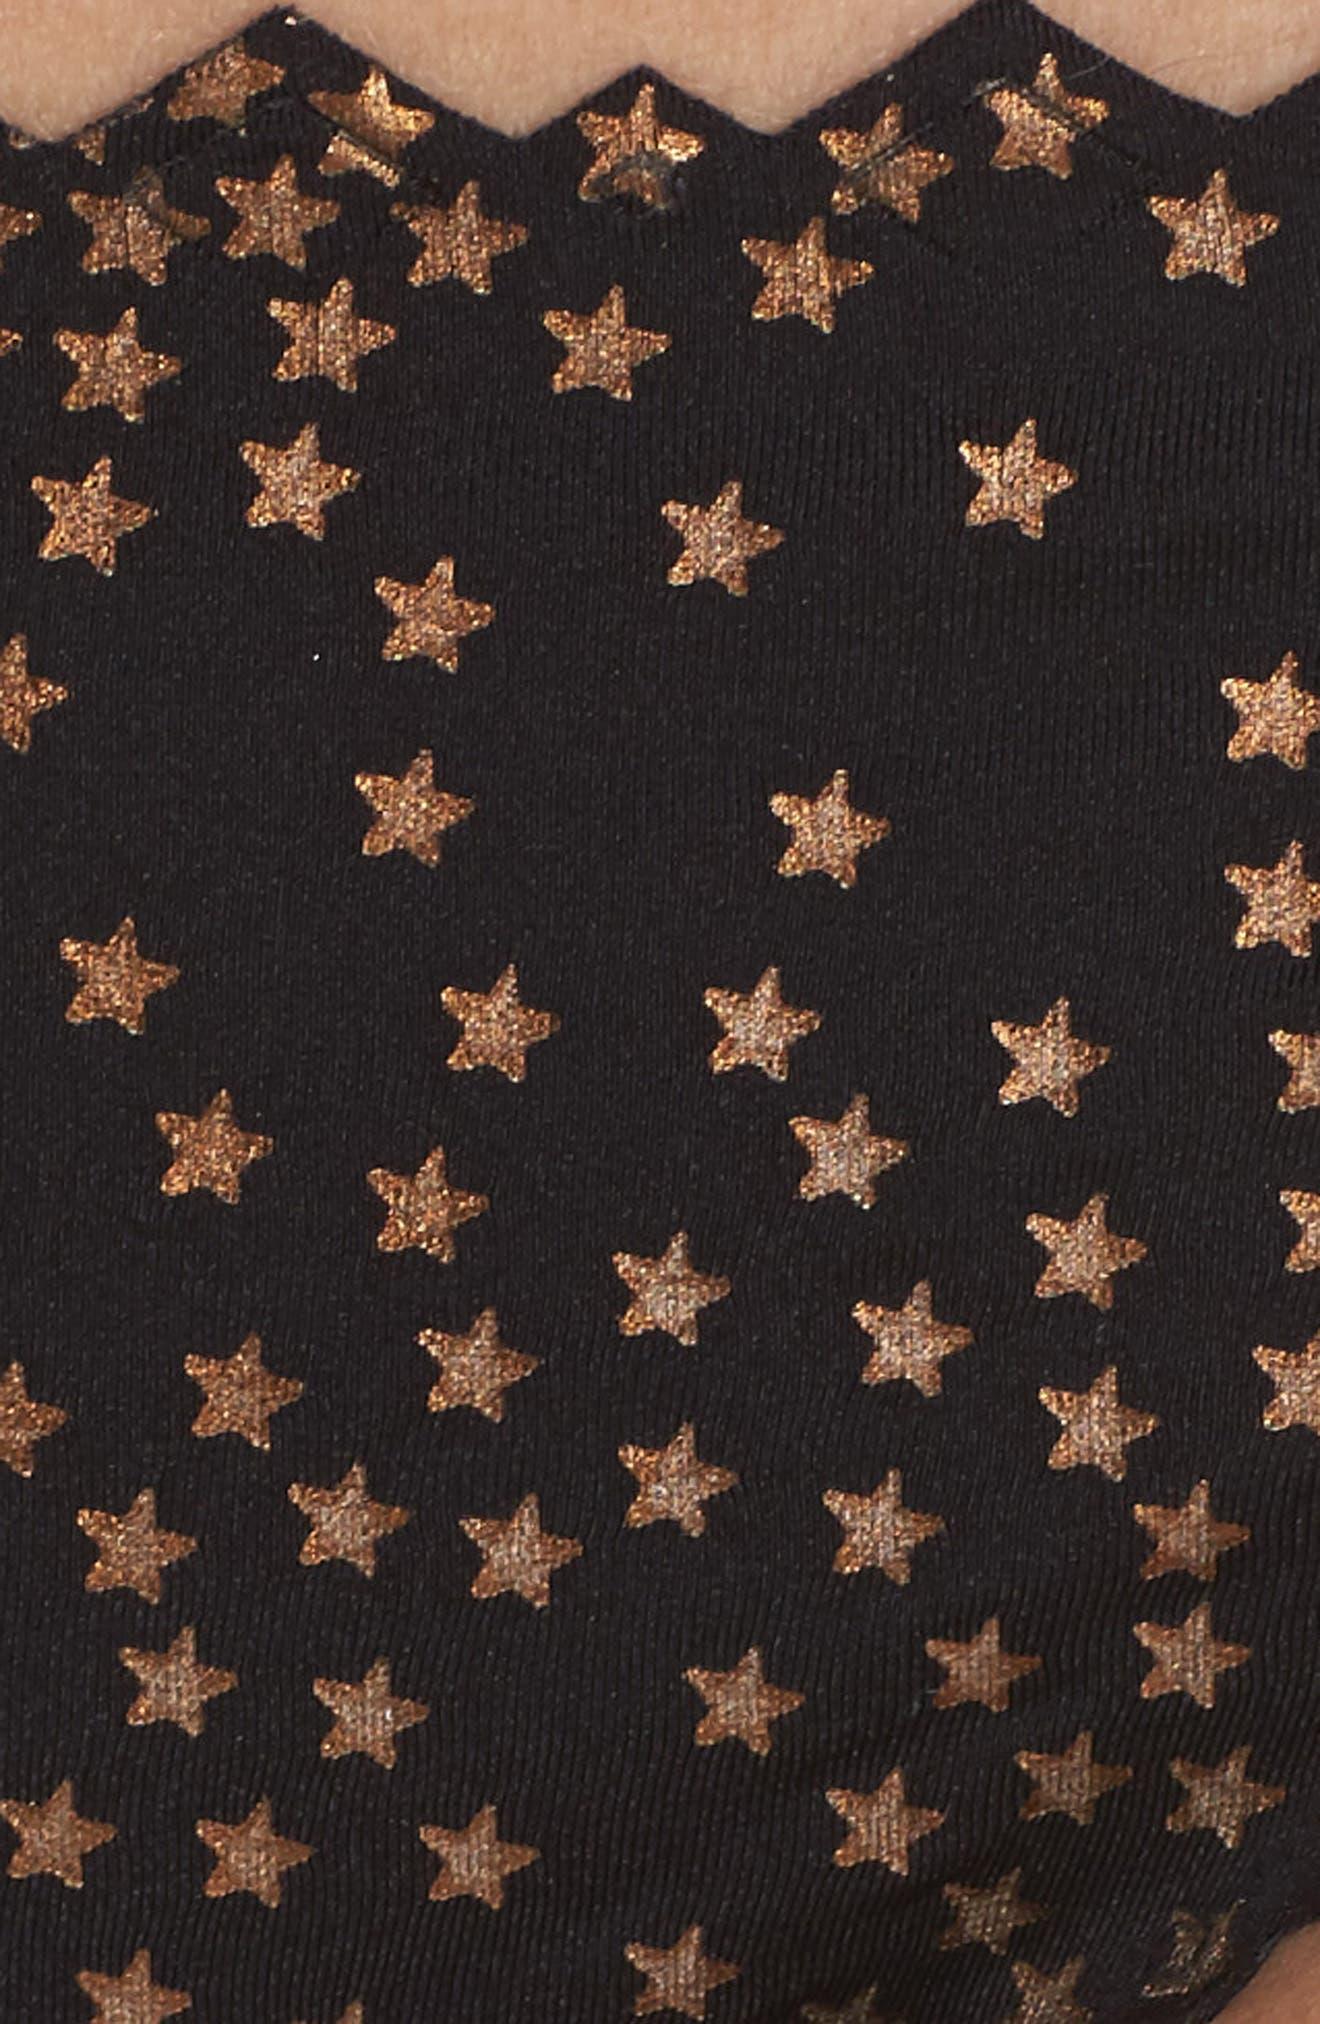 Ruffled Star Bikini Bottoms,                             Alternate thumbnail 5, color,                             Black City Of Stars